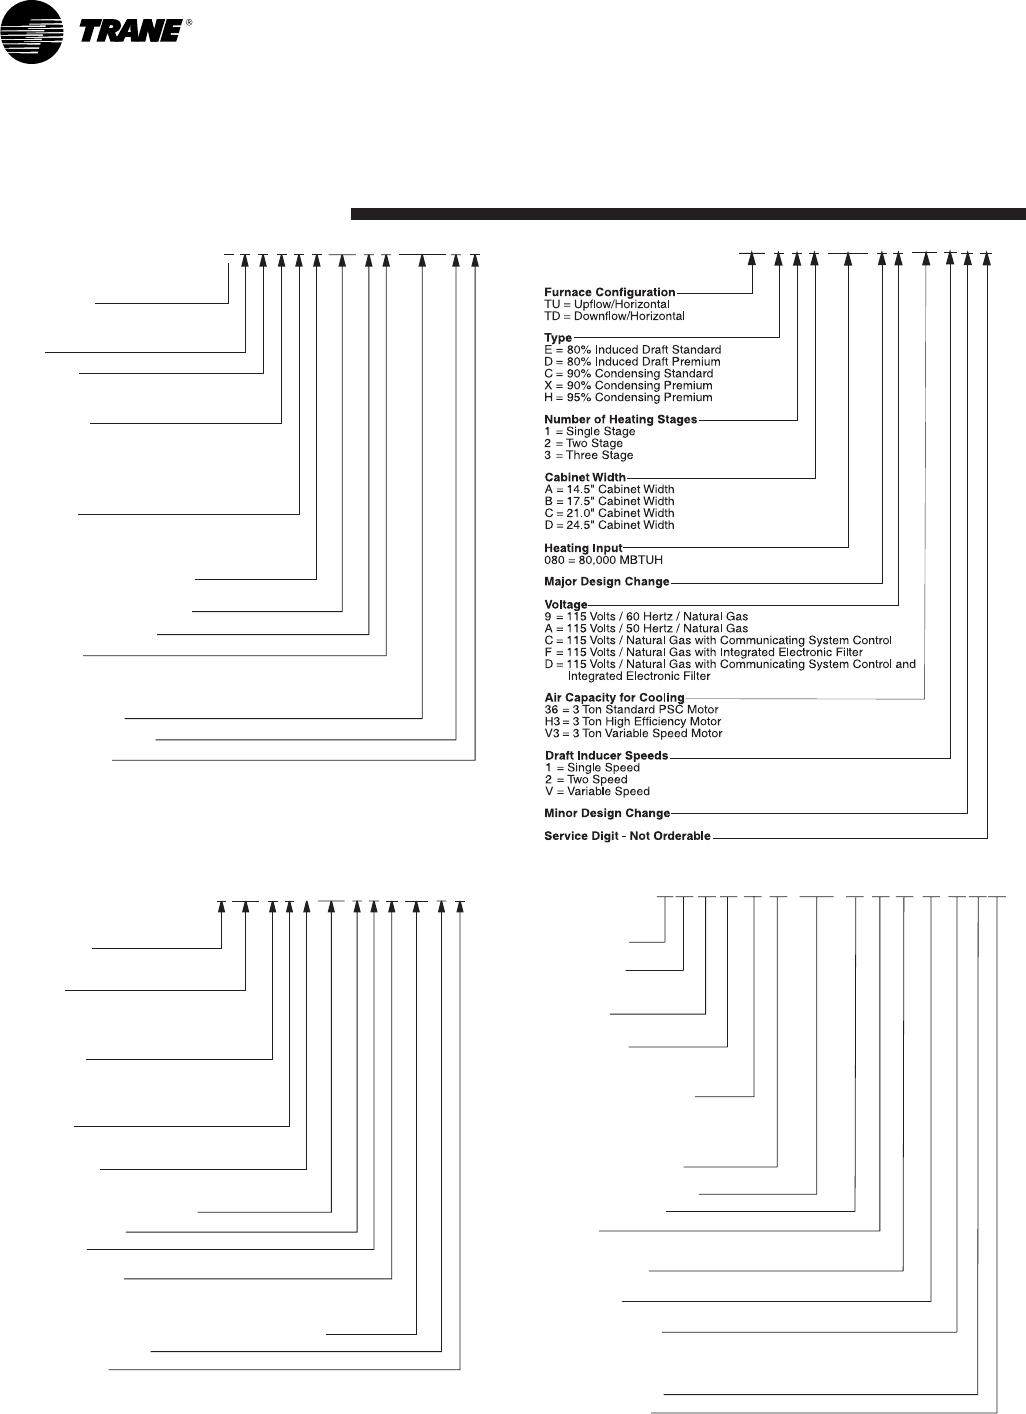 Trane 4TTX6036, 4TTX6048, 4TTX6060E, 060E Model Nomenclature